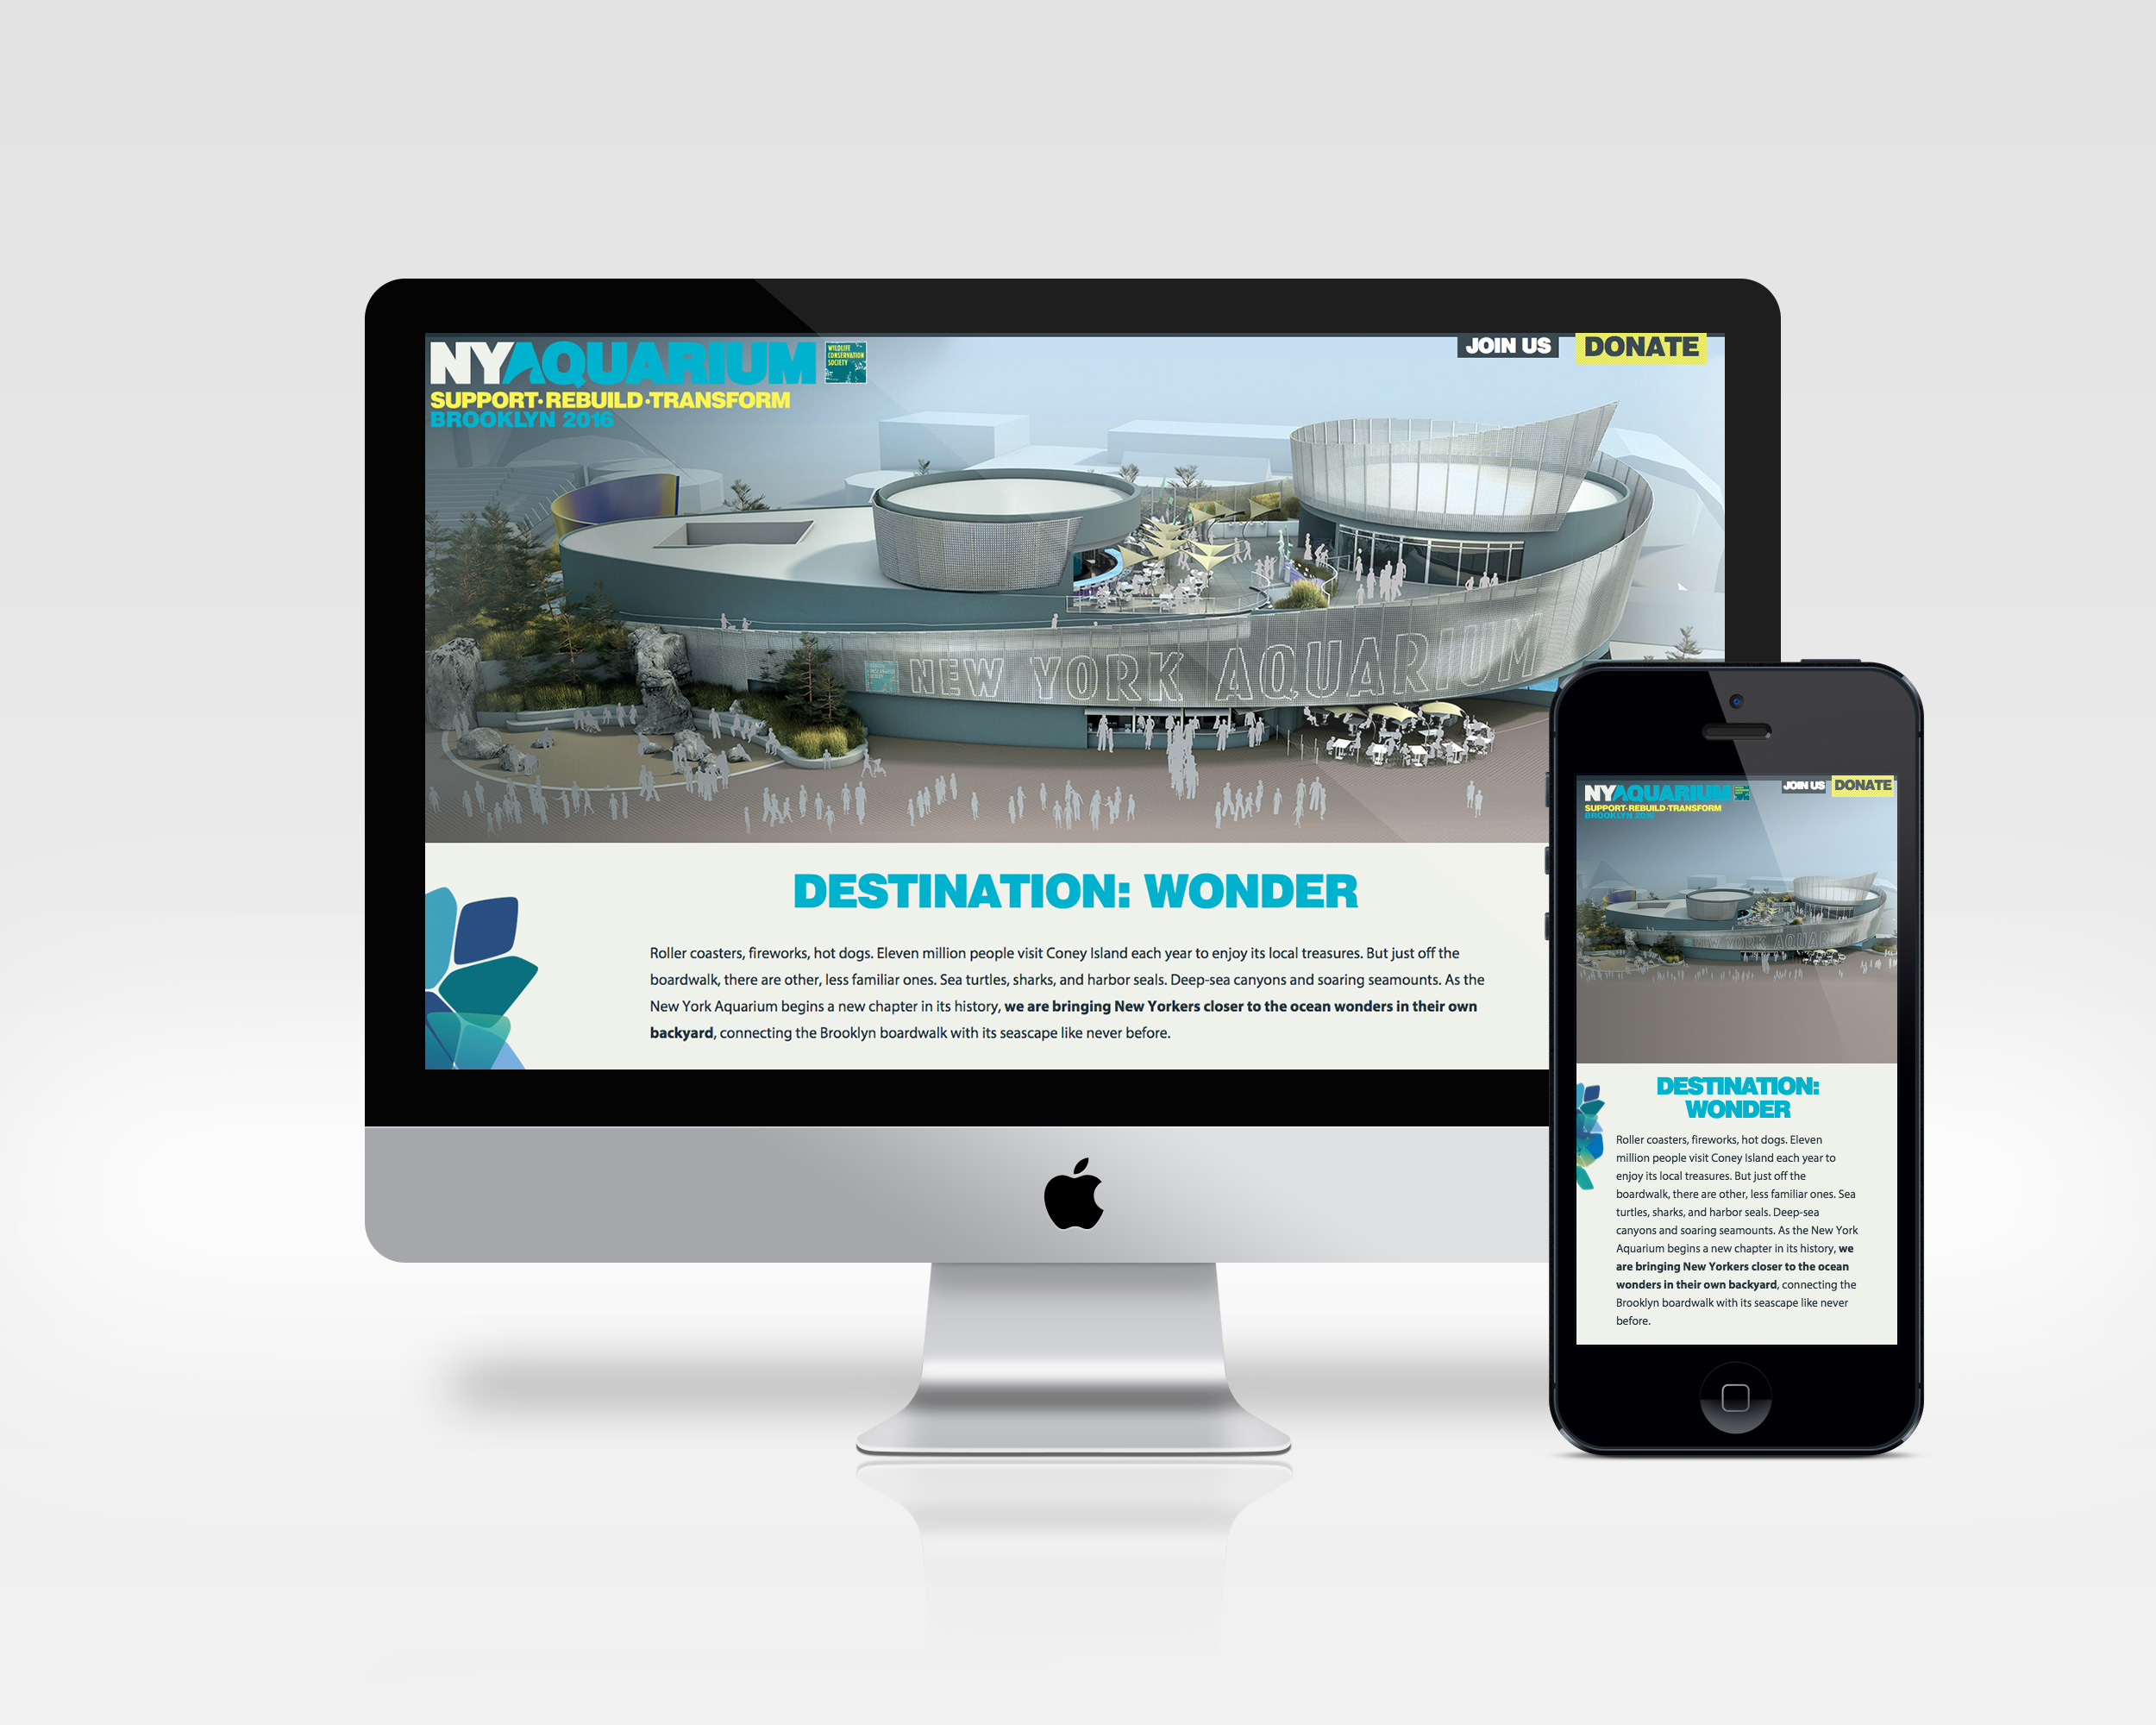 ny aquarium   design, ux, development   Microsite for the NY Aquarium's rebuilding & transformation campaign.   View Project